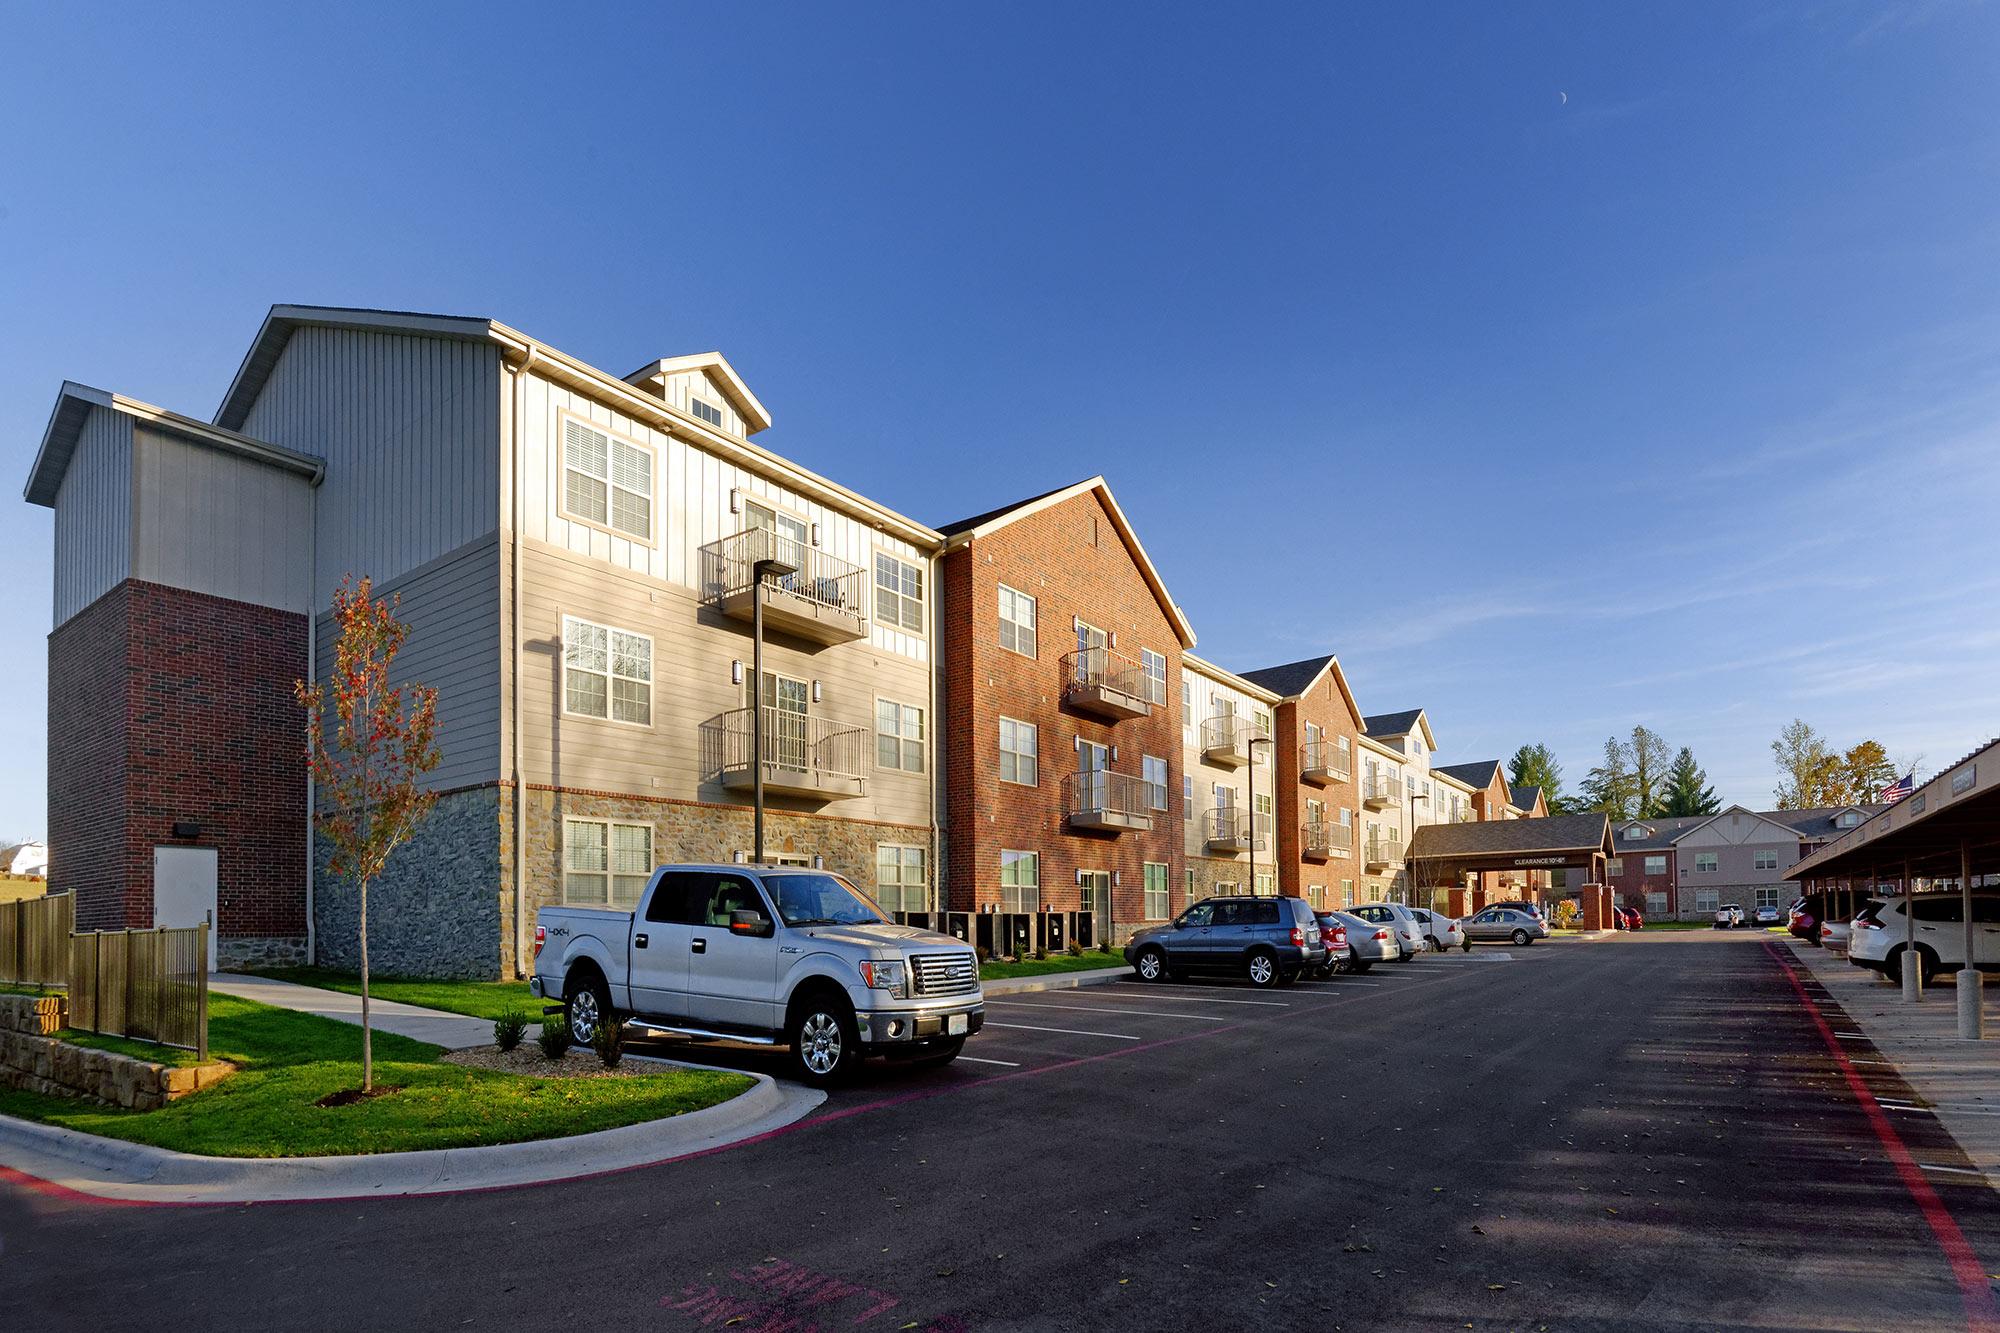 Castlewood-Senior-Living-H-Design-Exterior-03.jpg